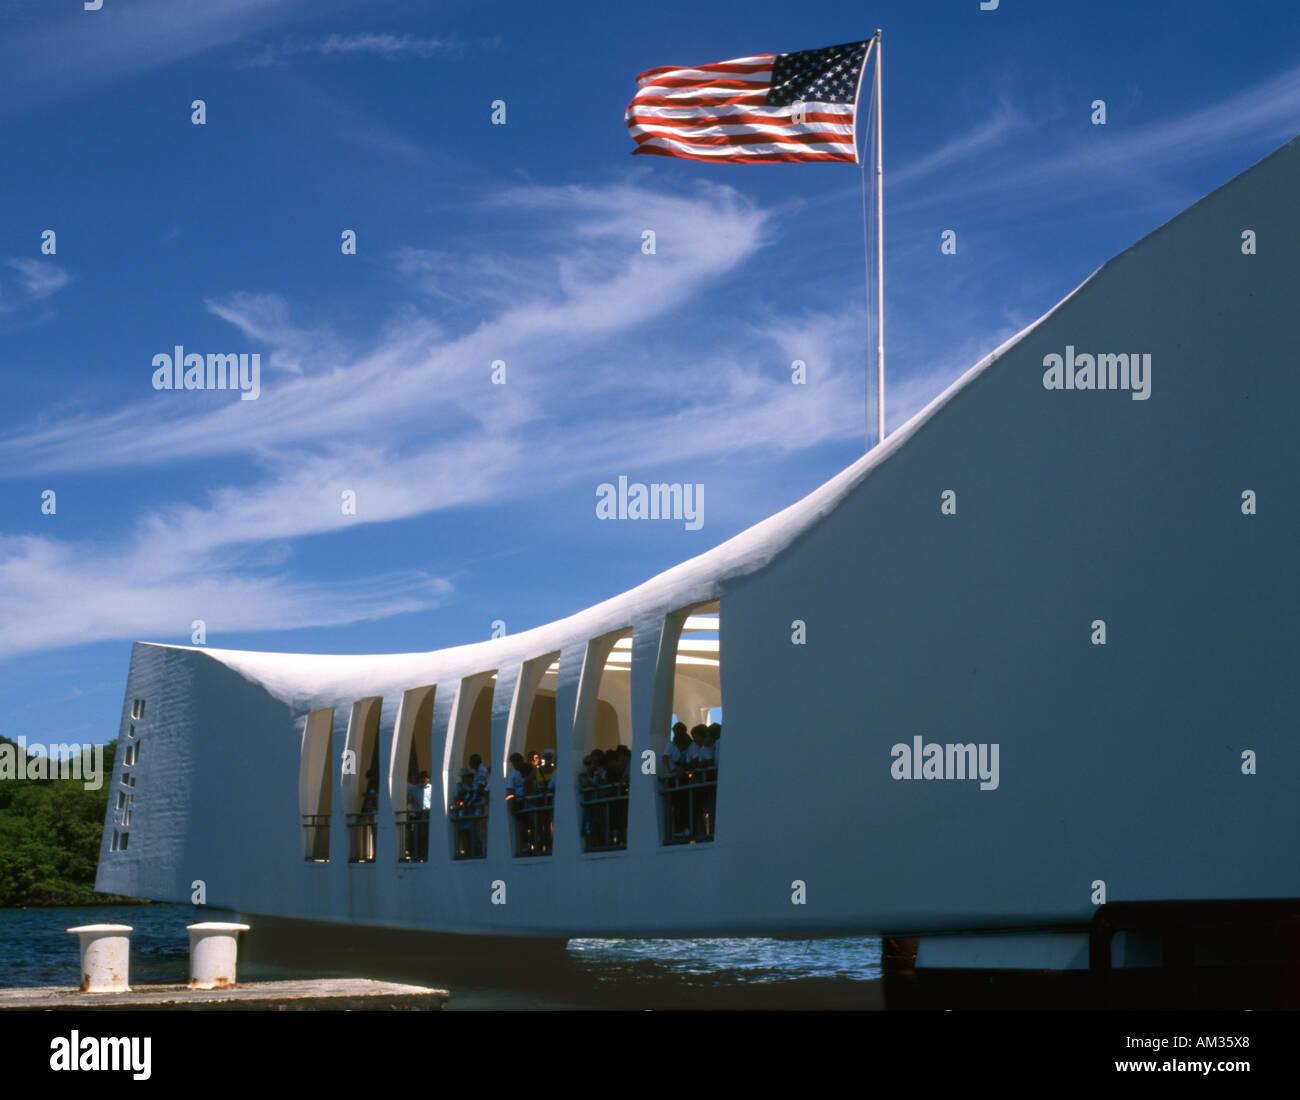 USA. Hawaii. Oahu. Pearl harbor. Arizona memorial. Stock Photo